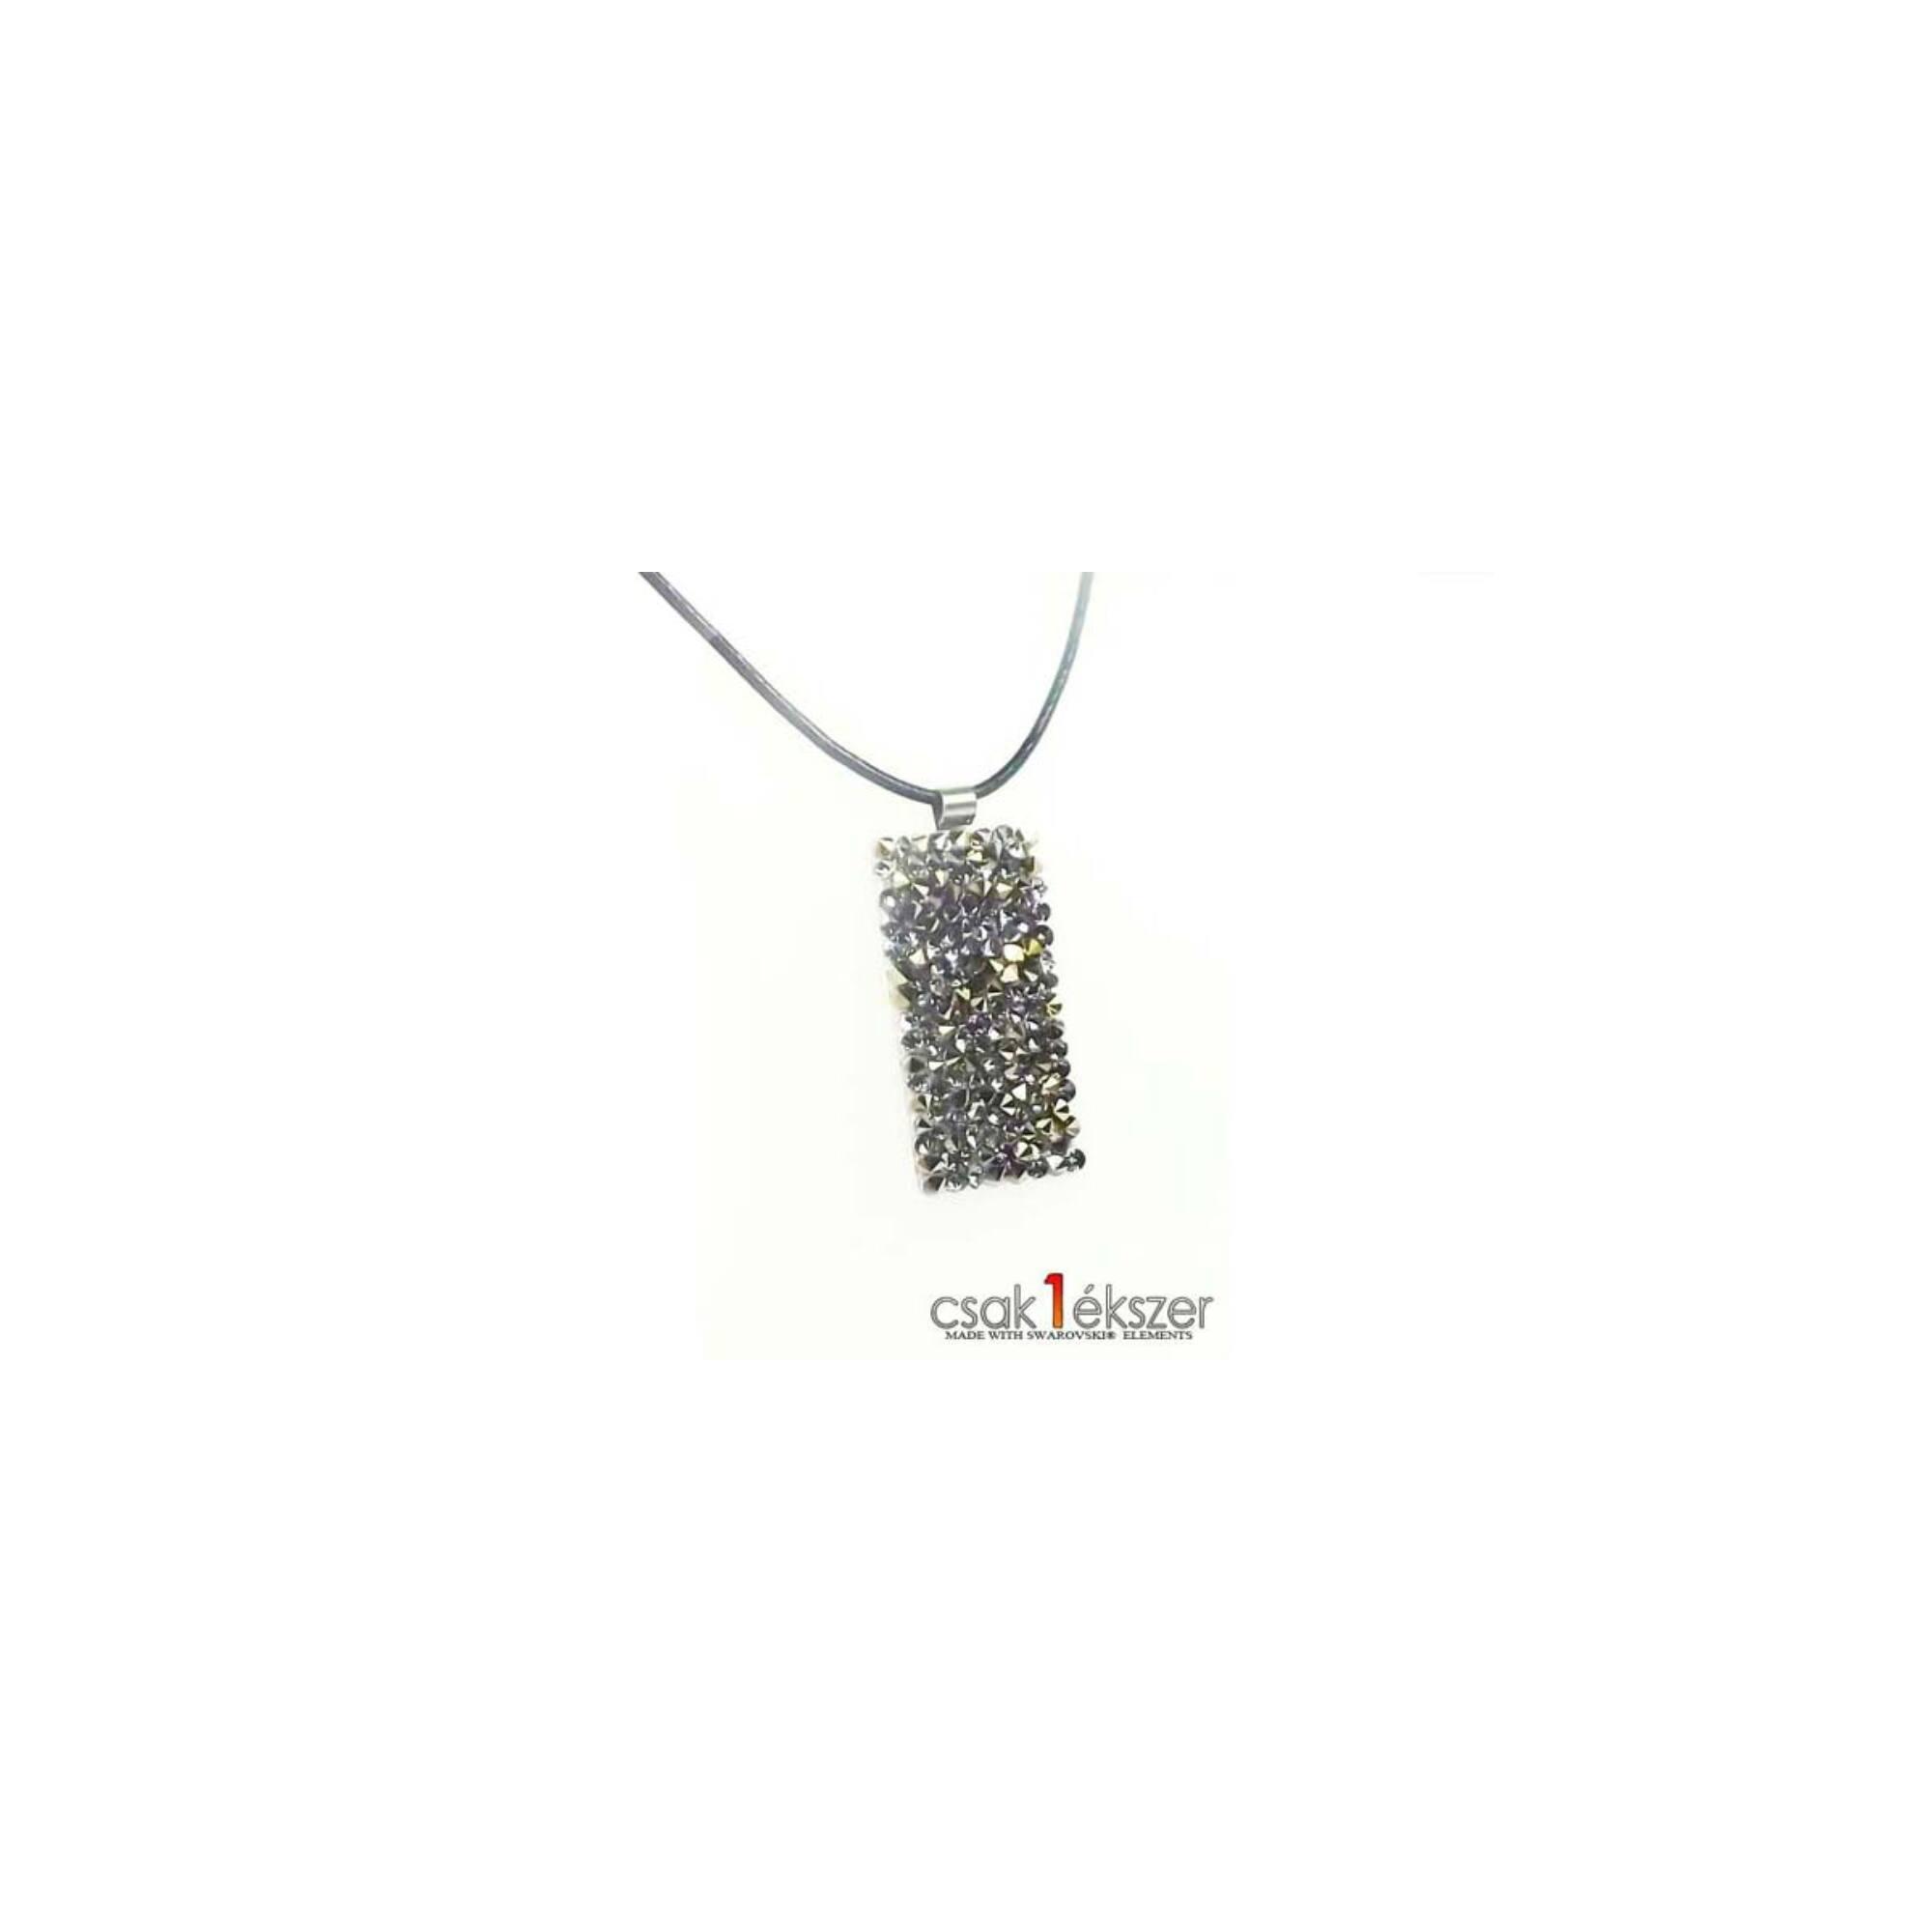 Crystal Rock medál Swarovski kristályokkal